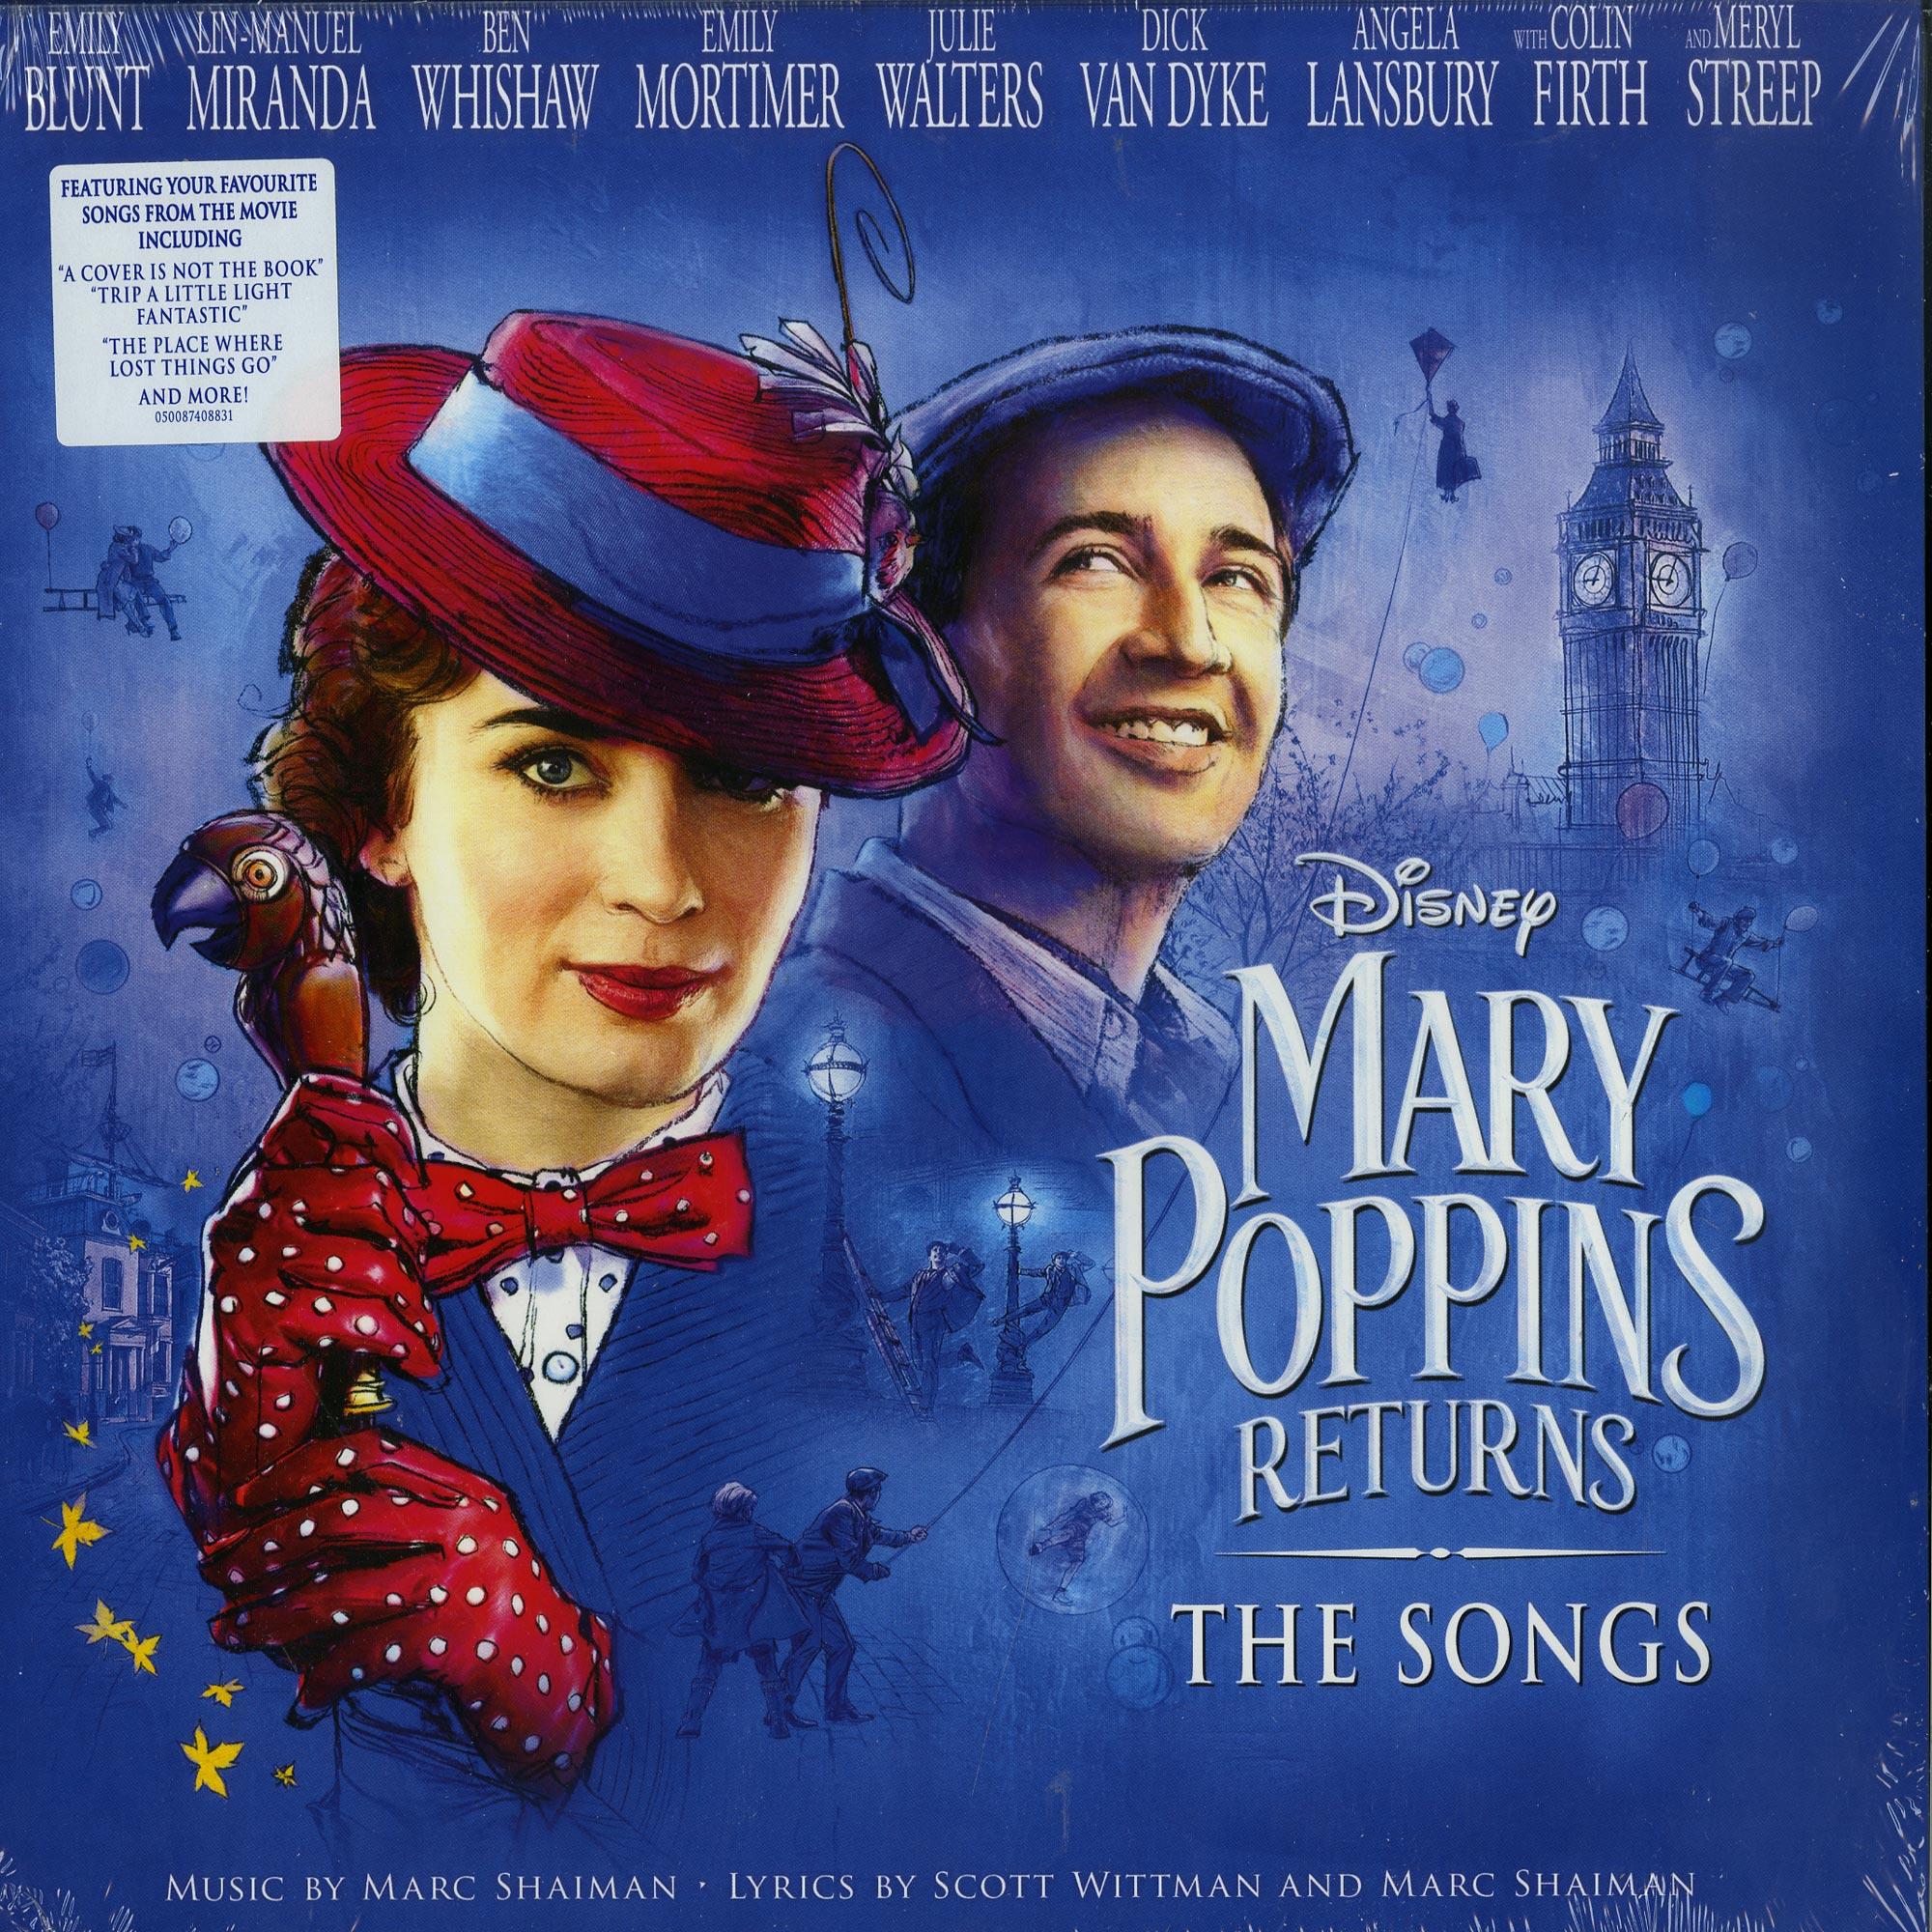 Marc Shaiman & Scott Wittman - MARY POPPINS RETURNS: THE SONGS